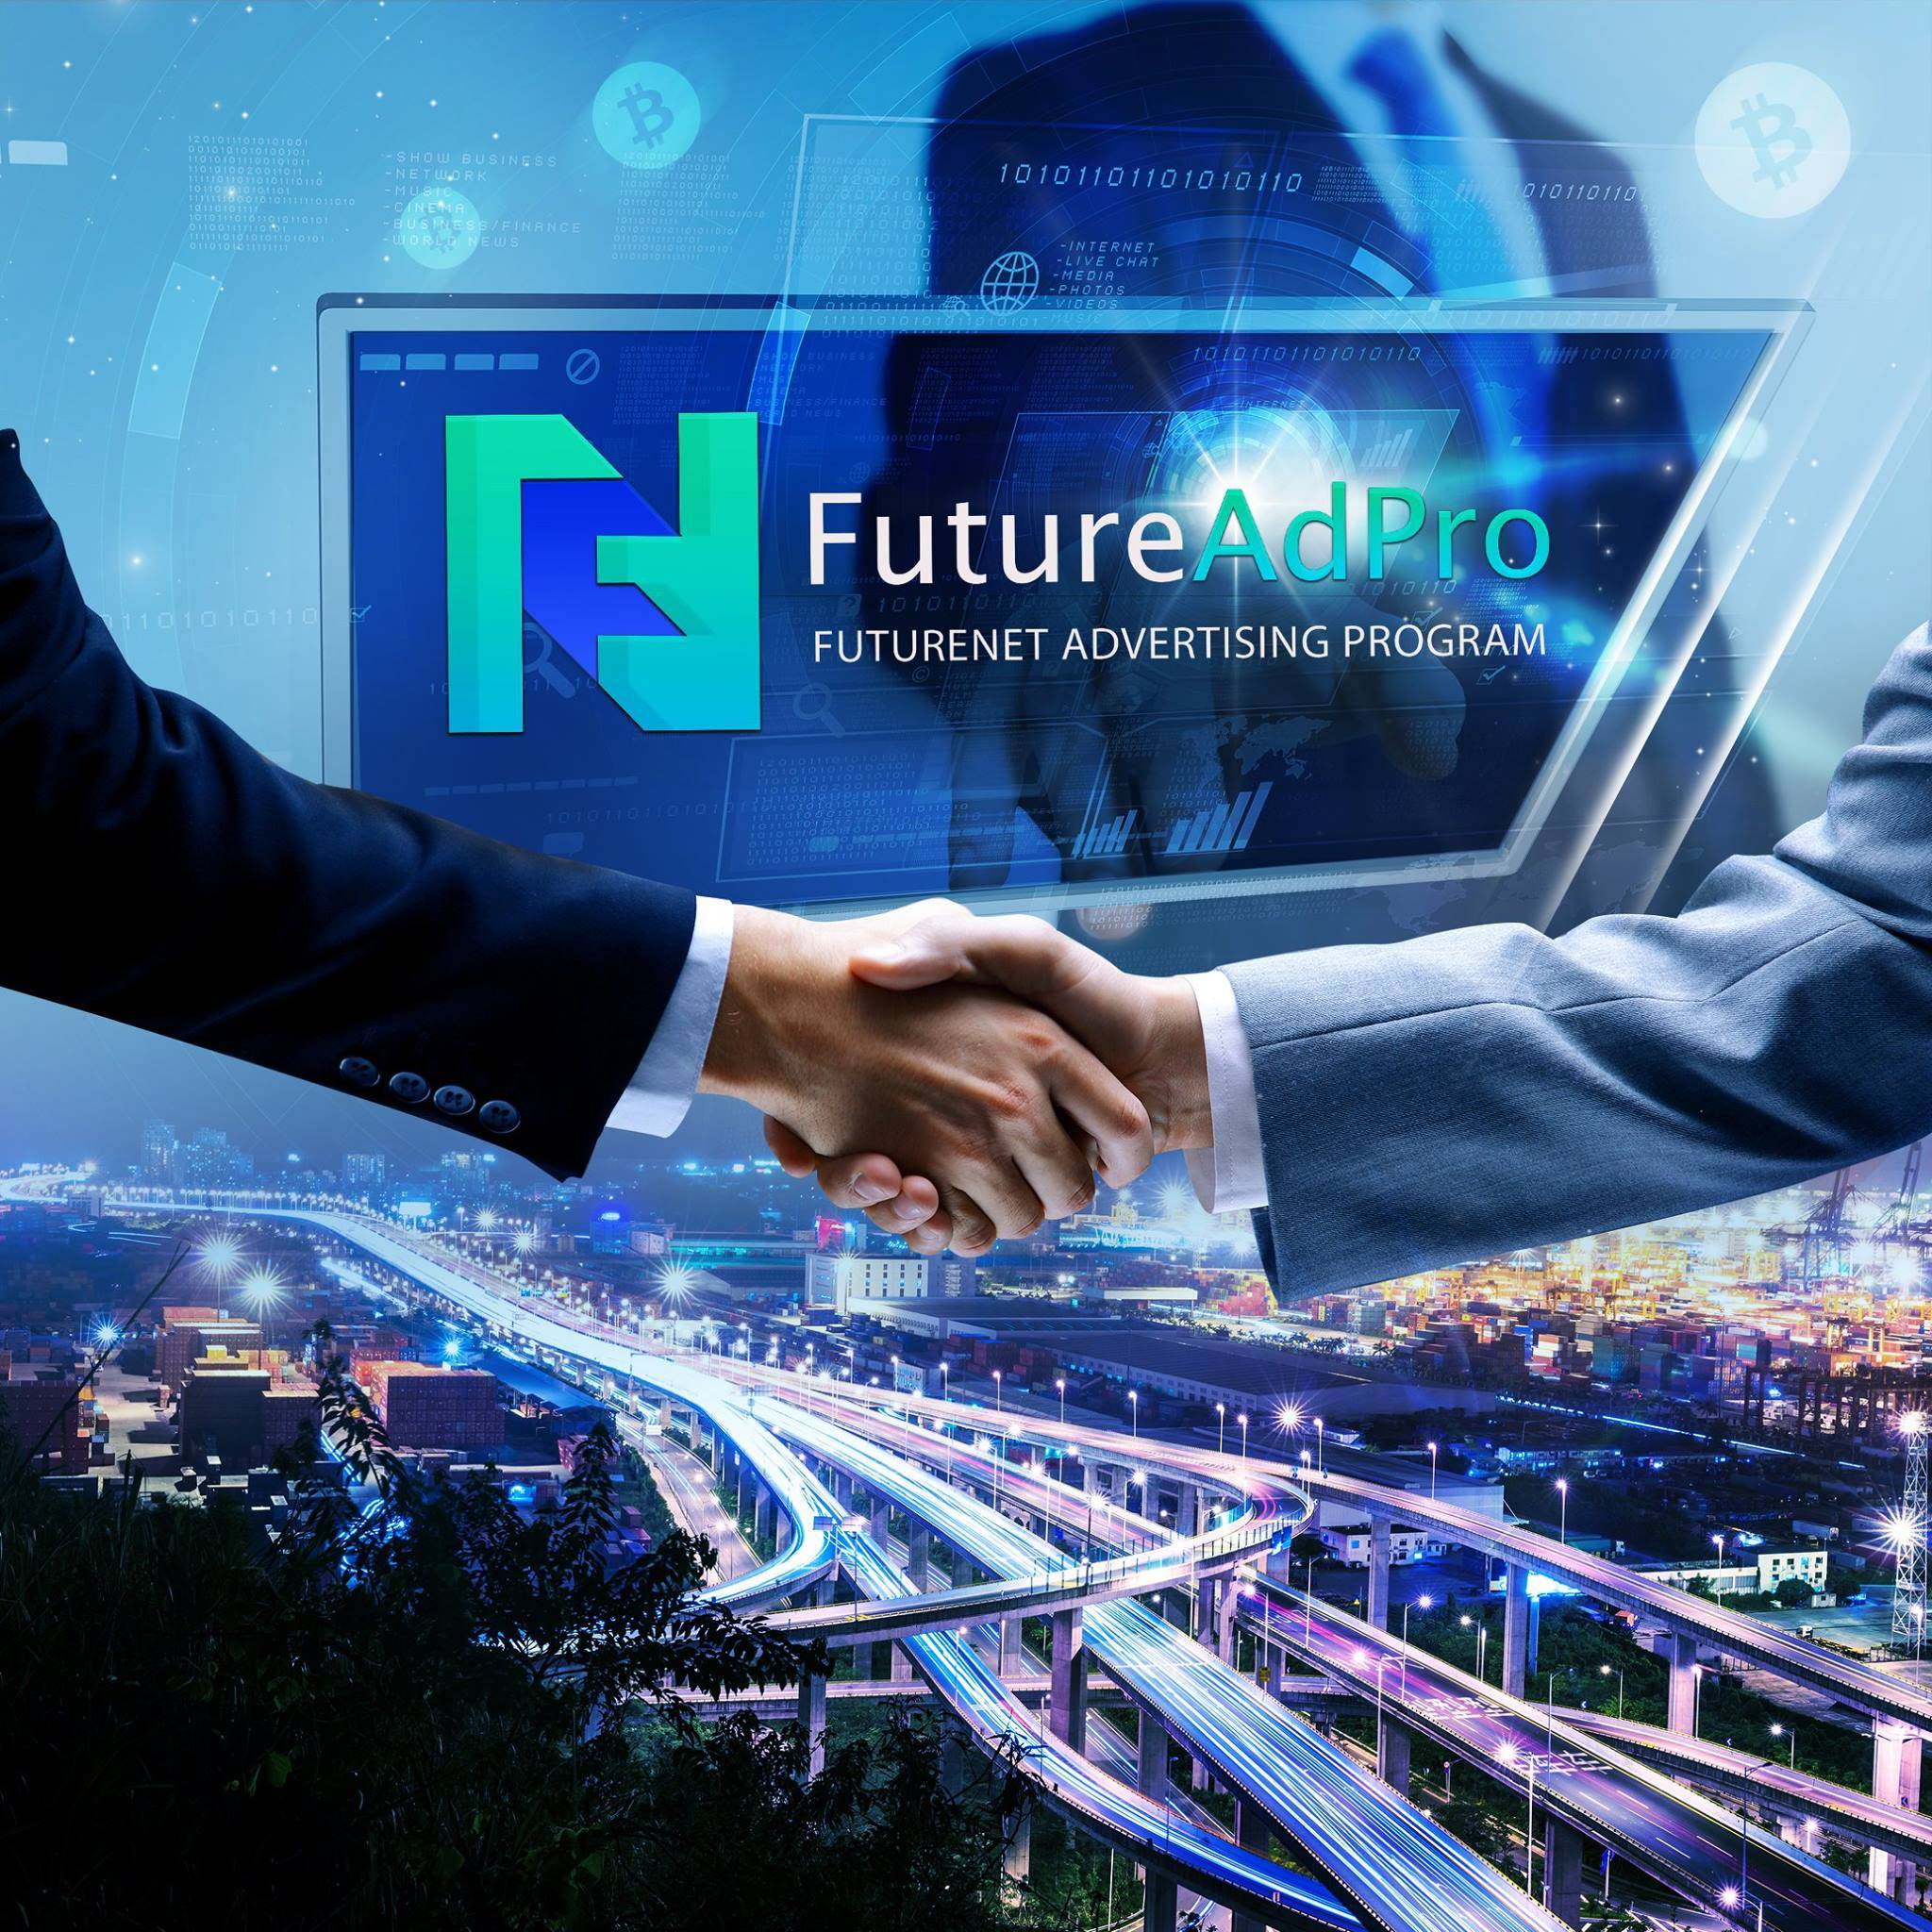 FutureAdPro Launch Date: 8 April 2016